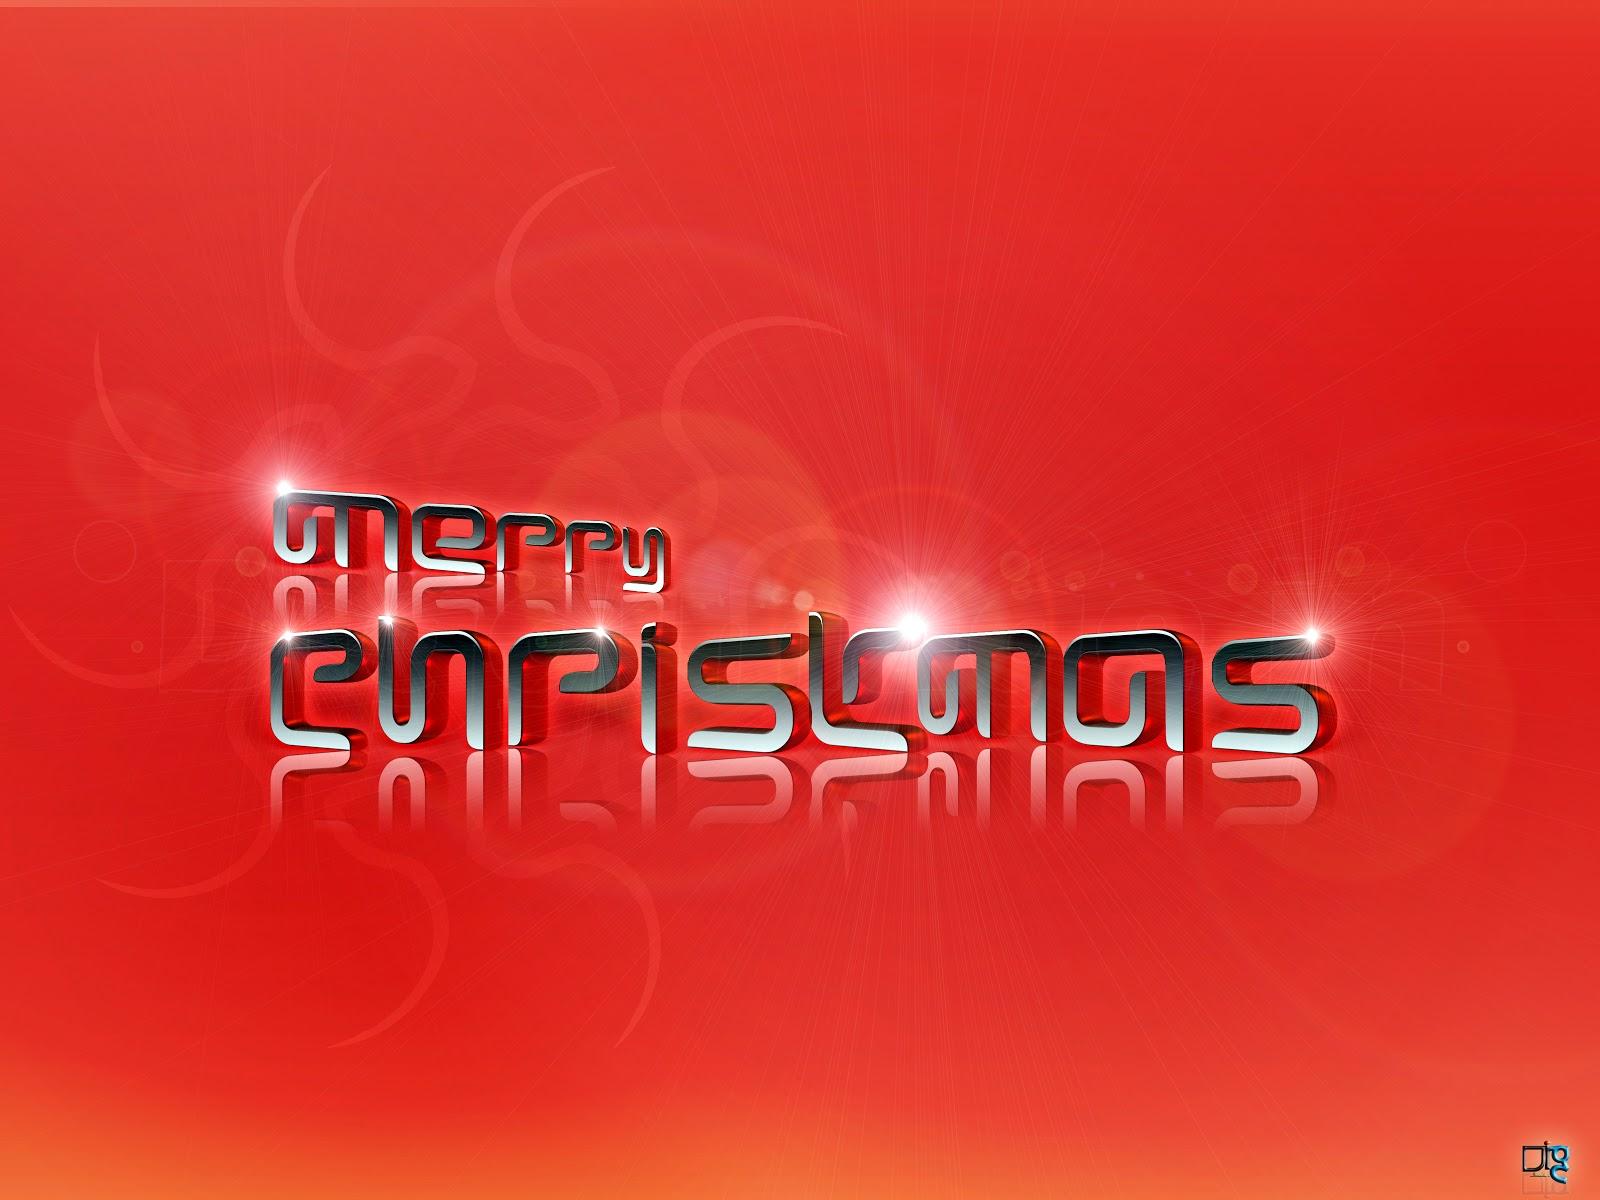 http://3.bp.blogspot.com/-UiAY0C1dzc0/UKPF98ZcgvI/AAAAAAAADPM/mJjecaiz-E8/s1600/3200x2400-christmas+greetings+and+hd+wallpaper+free+download+images+scraps.JPG